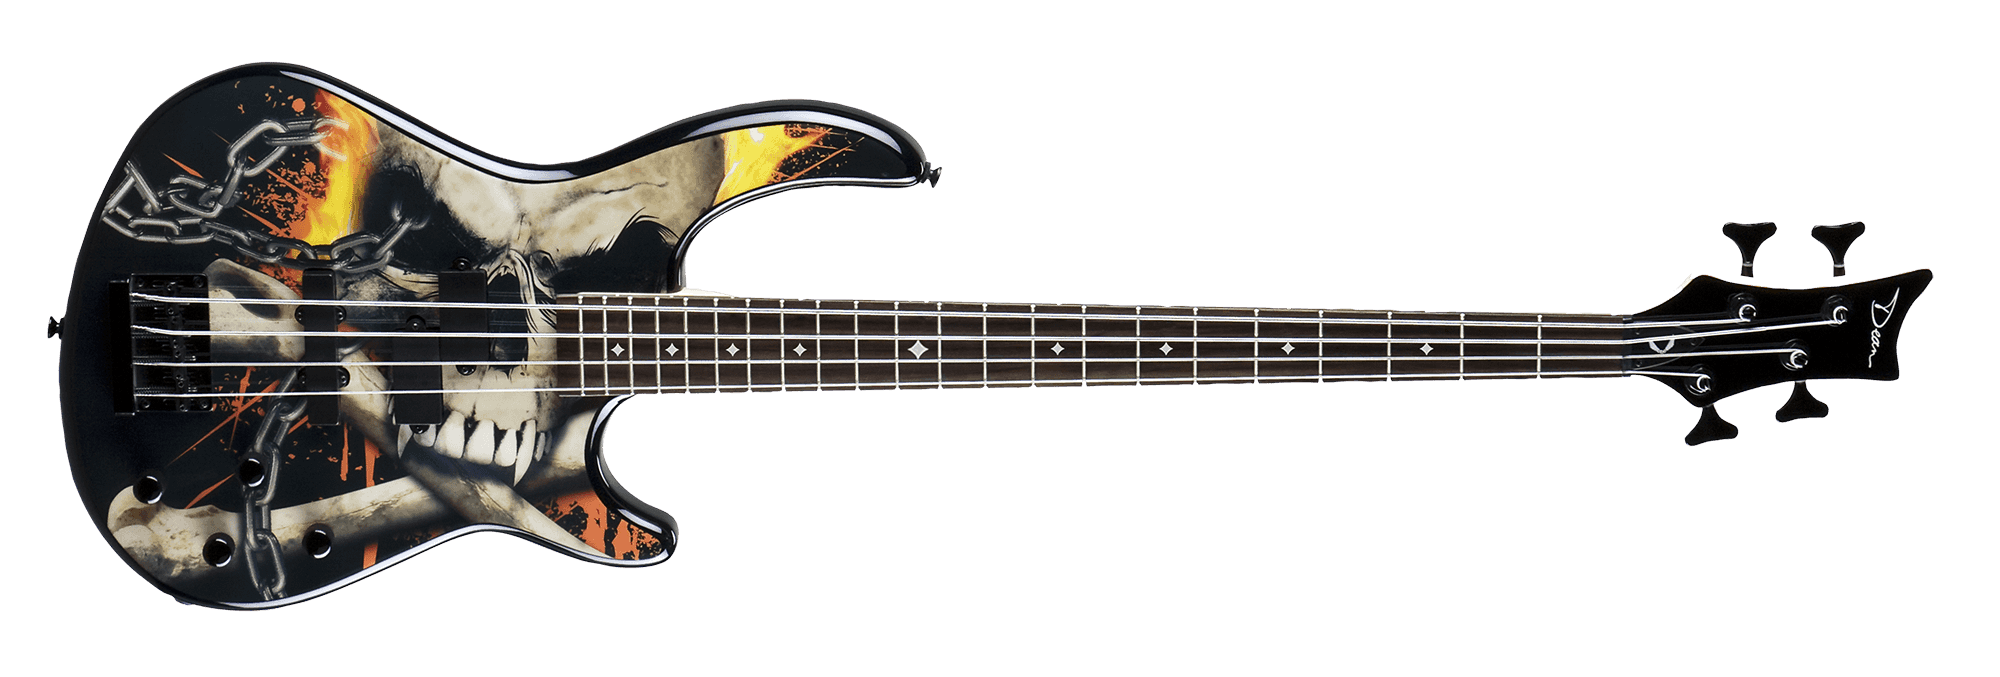 dean bass guitar wiring diagram trusted wiring diagram u2022 rh soulmatestyle co  dean bass guitar wiring diagram